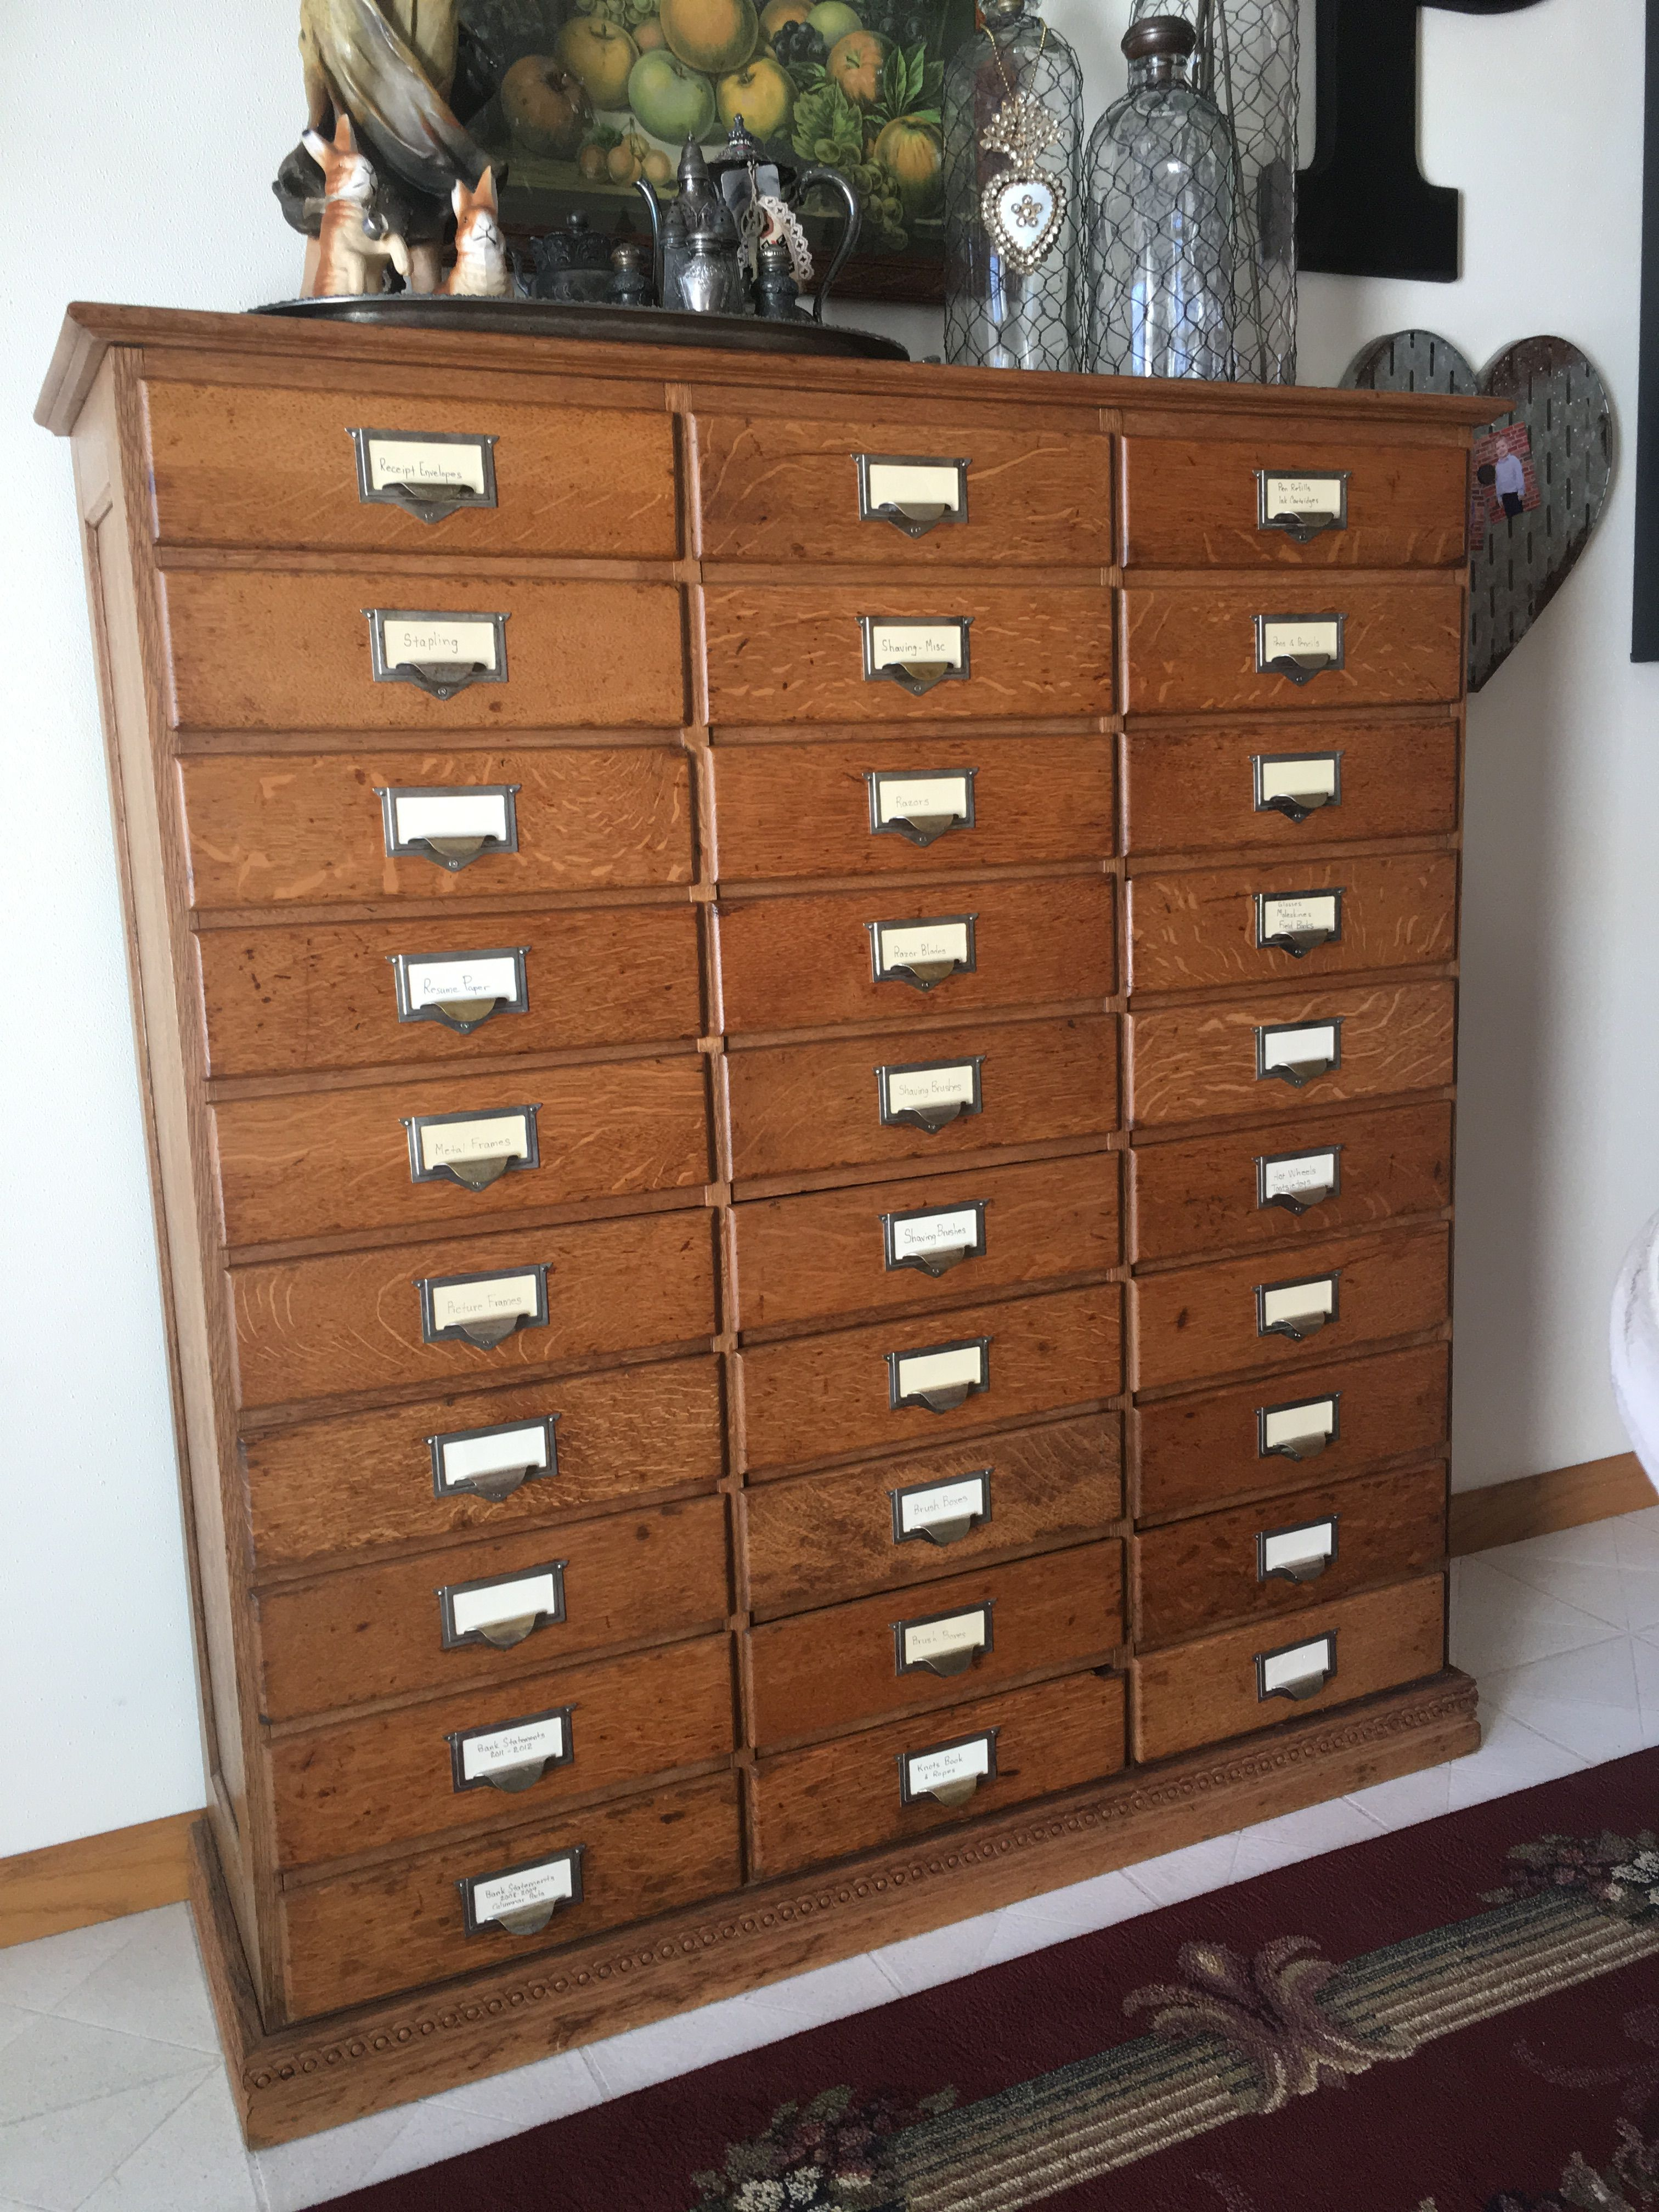 Vintage filing cabinet it now holds stuff cupboards and vintage filing cabinet it now holds stuff malvernweather Choice Image